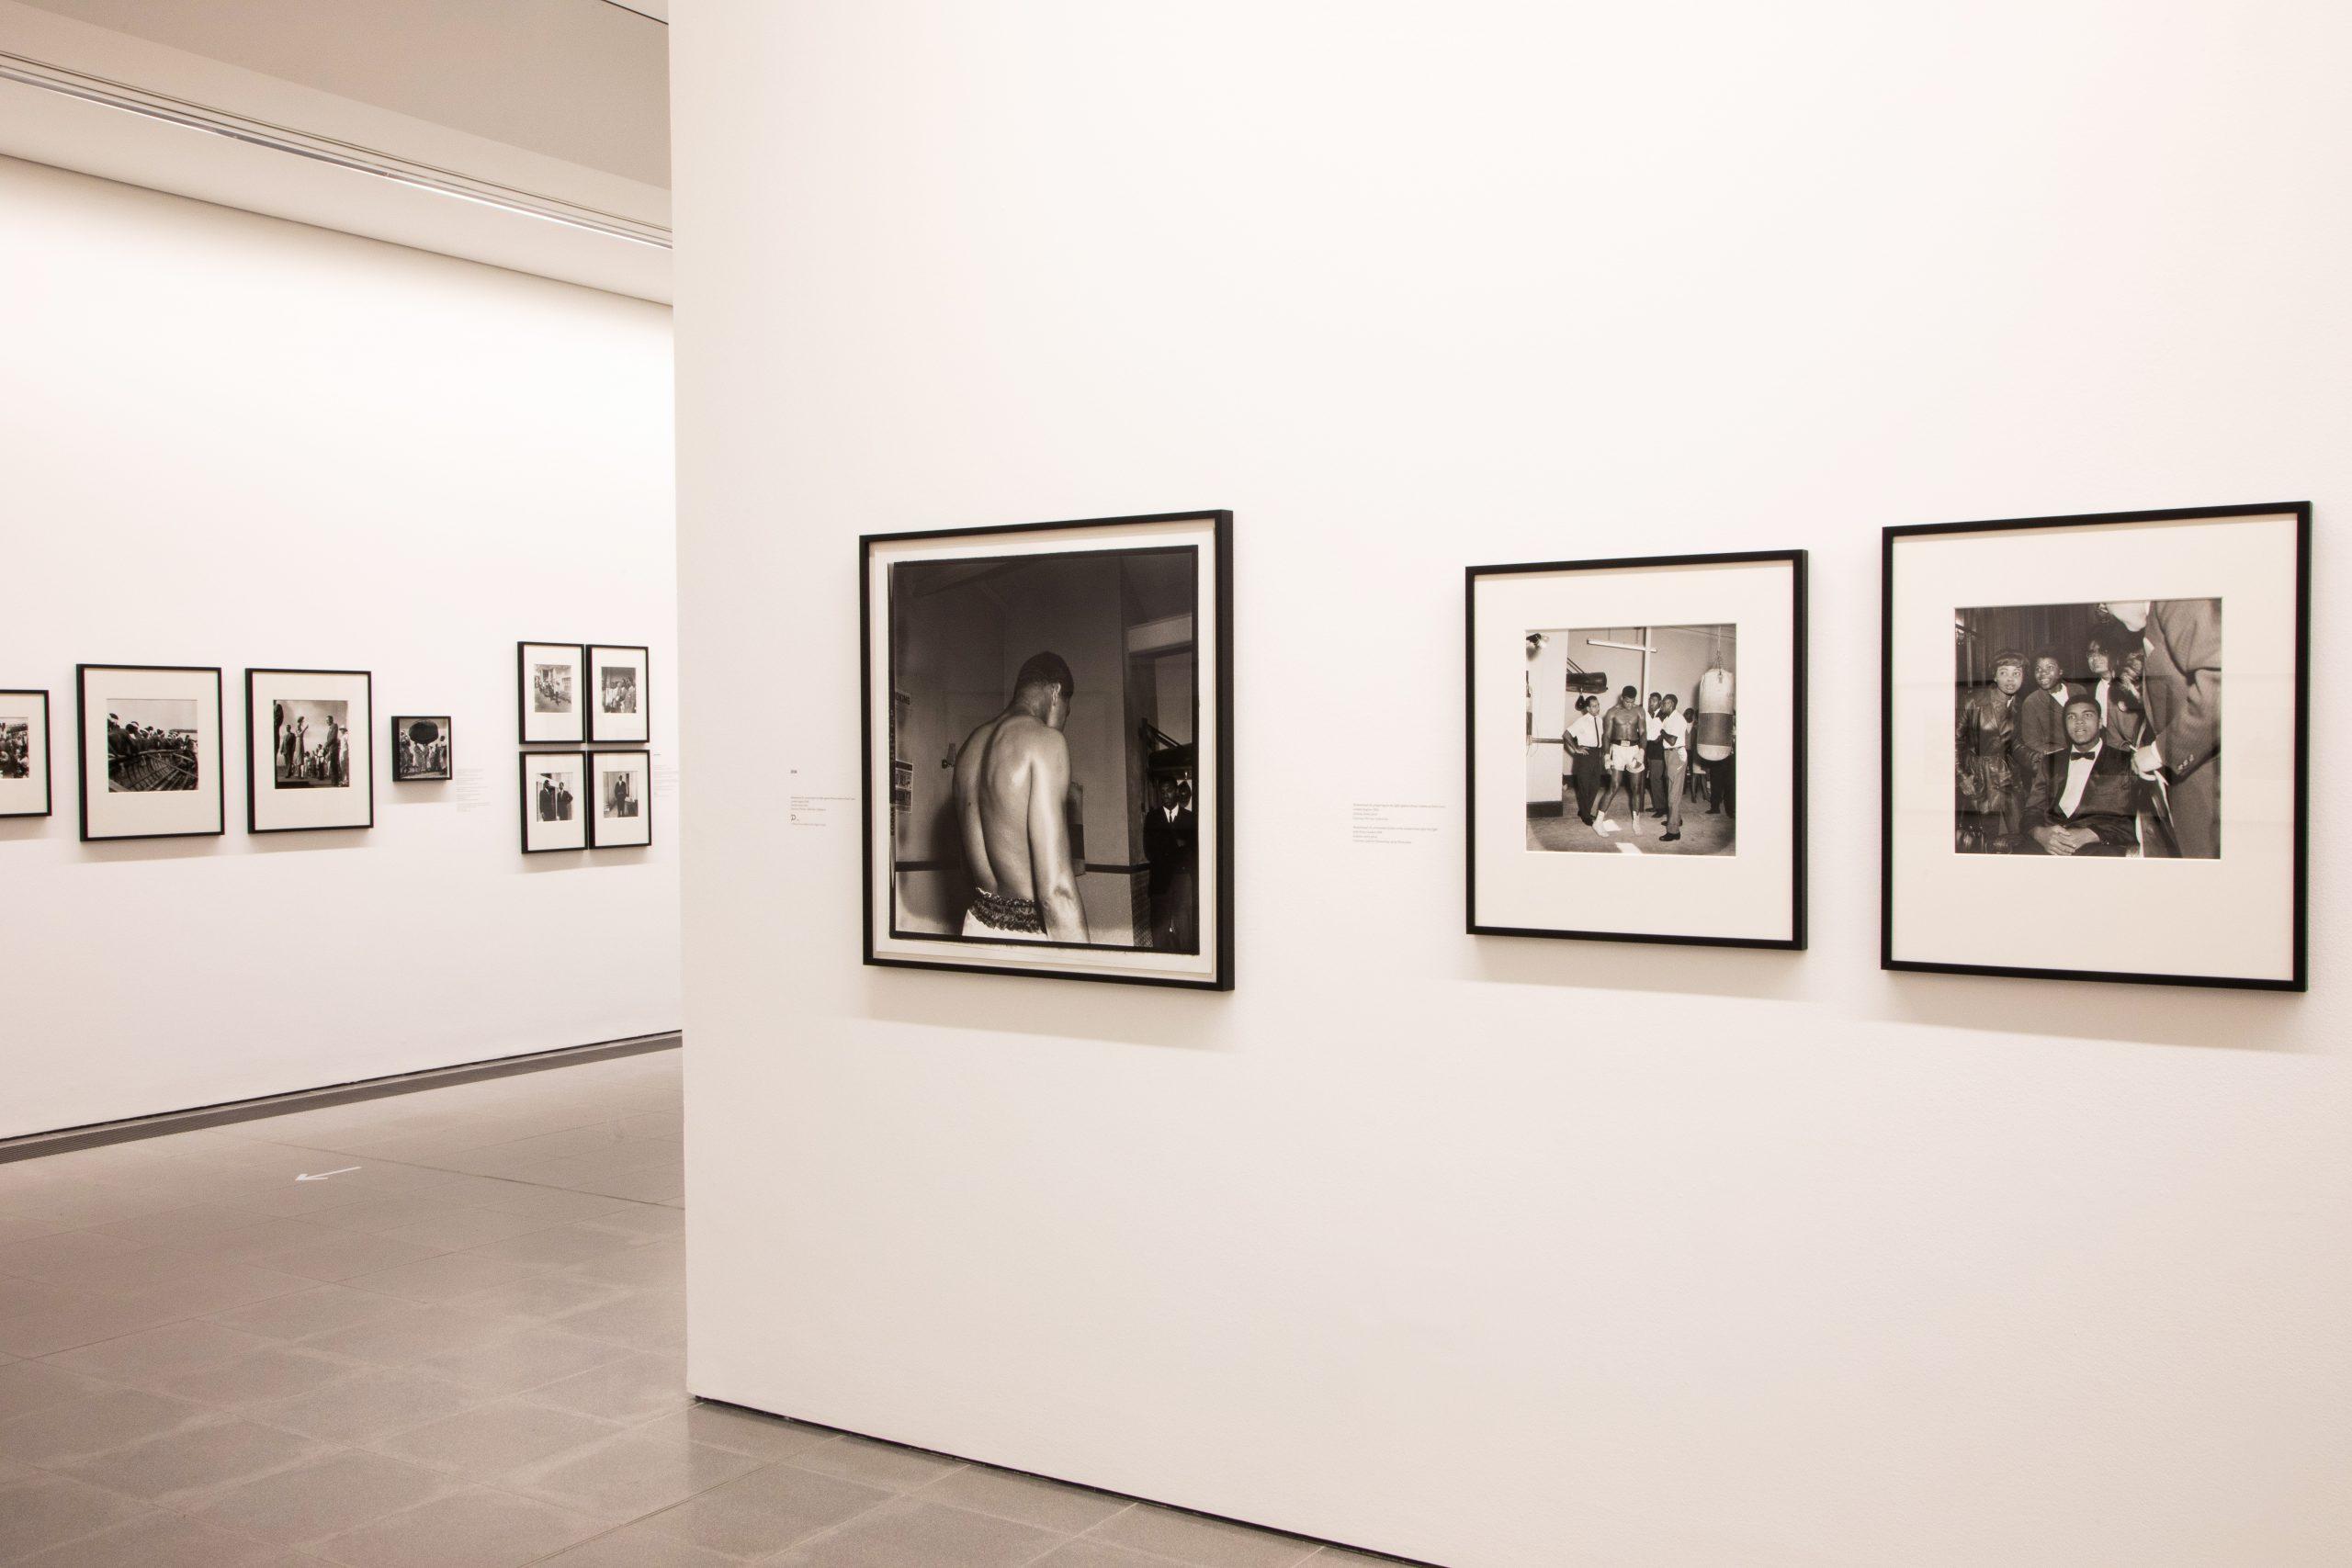 James Barnor: Accra/London - A Retrospective (Installation view, 19 May – 24 October 2021, Serpentine)